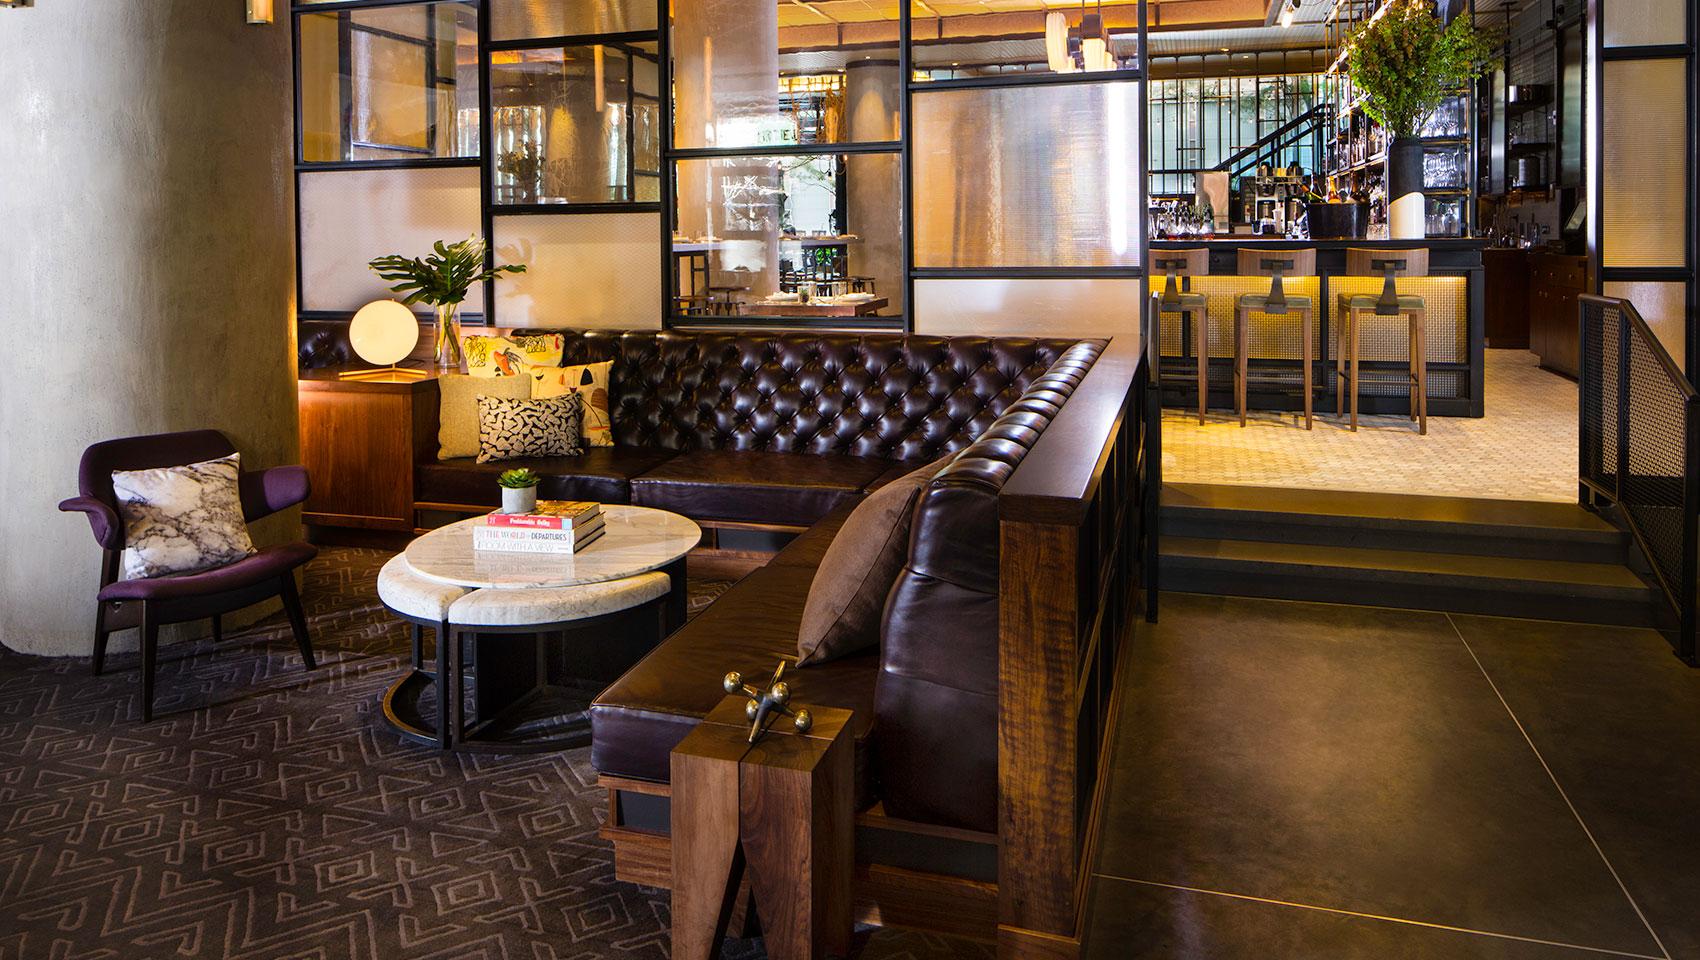 Phish new year 39 s run 2017 2018 cid entertainment - Luxury hotels near madison square garden ...